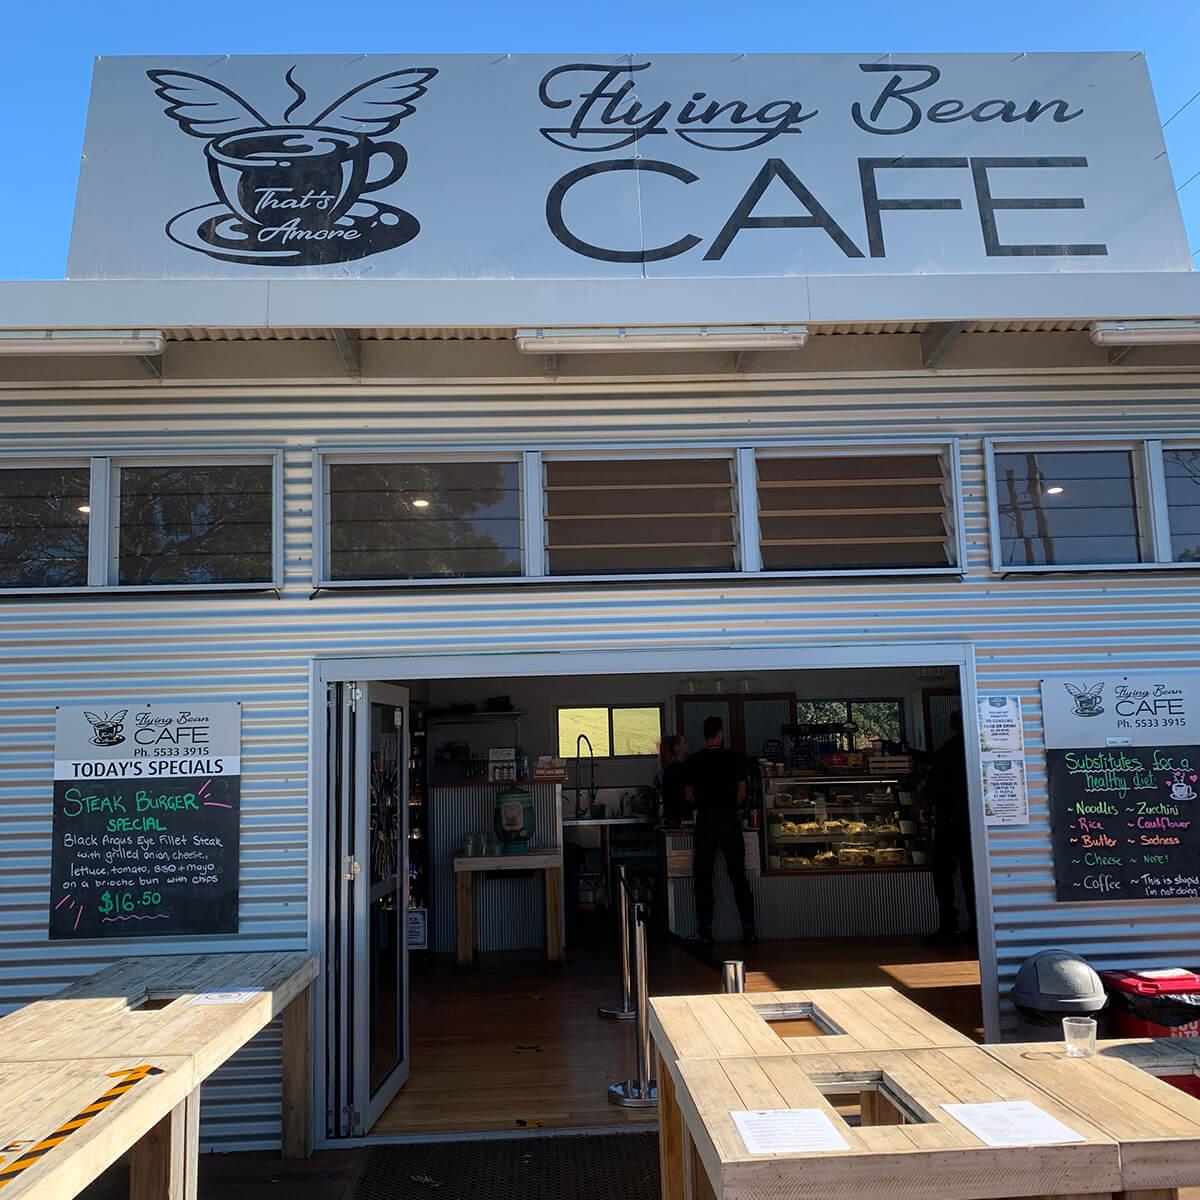 Flying Bean Cafe